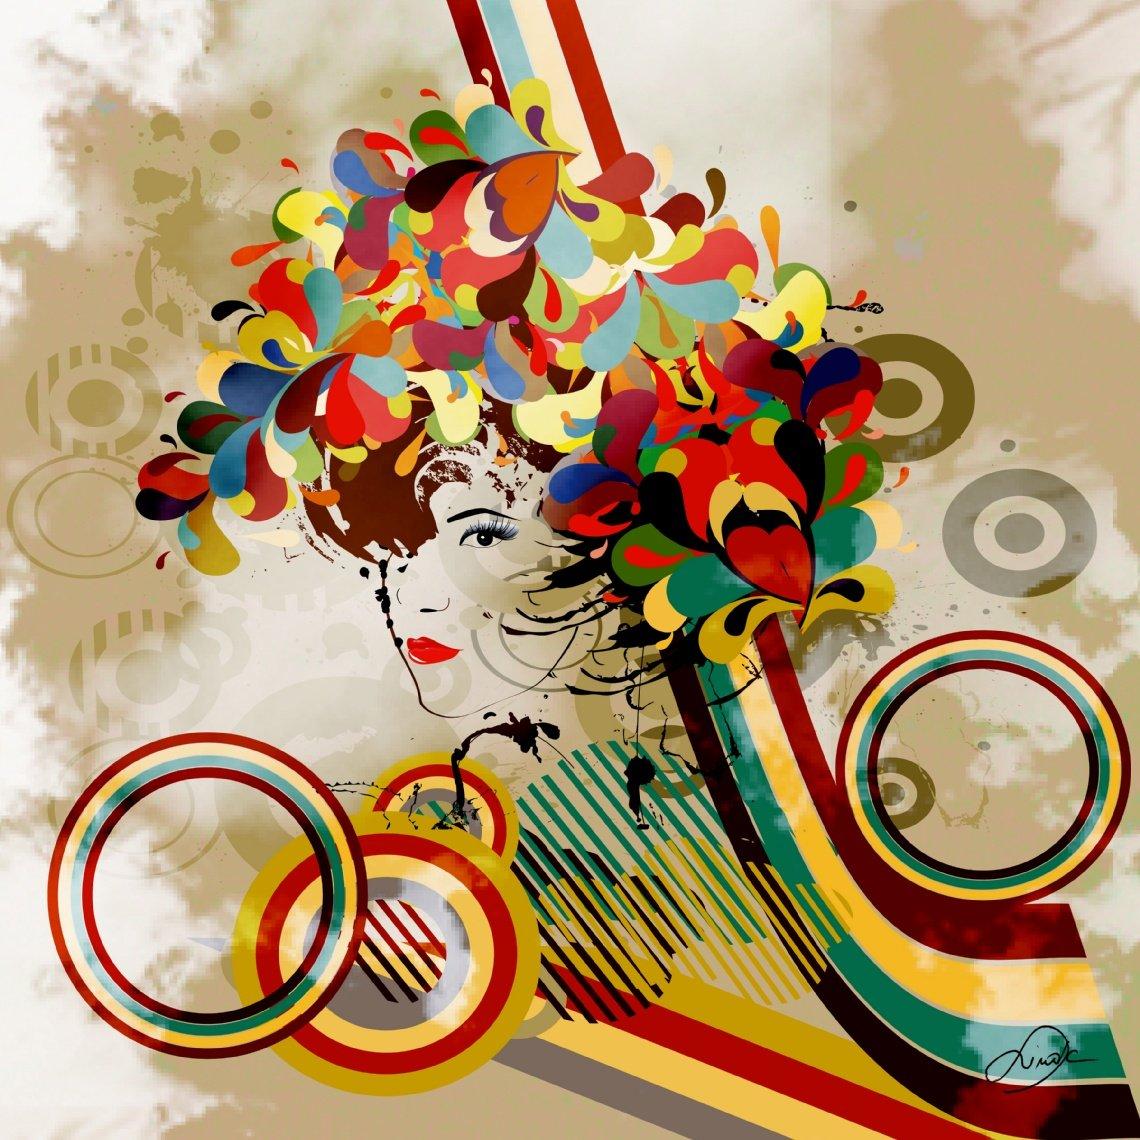 Franks Toybox: Graphic Art